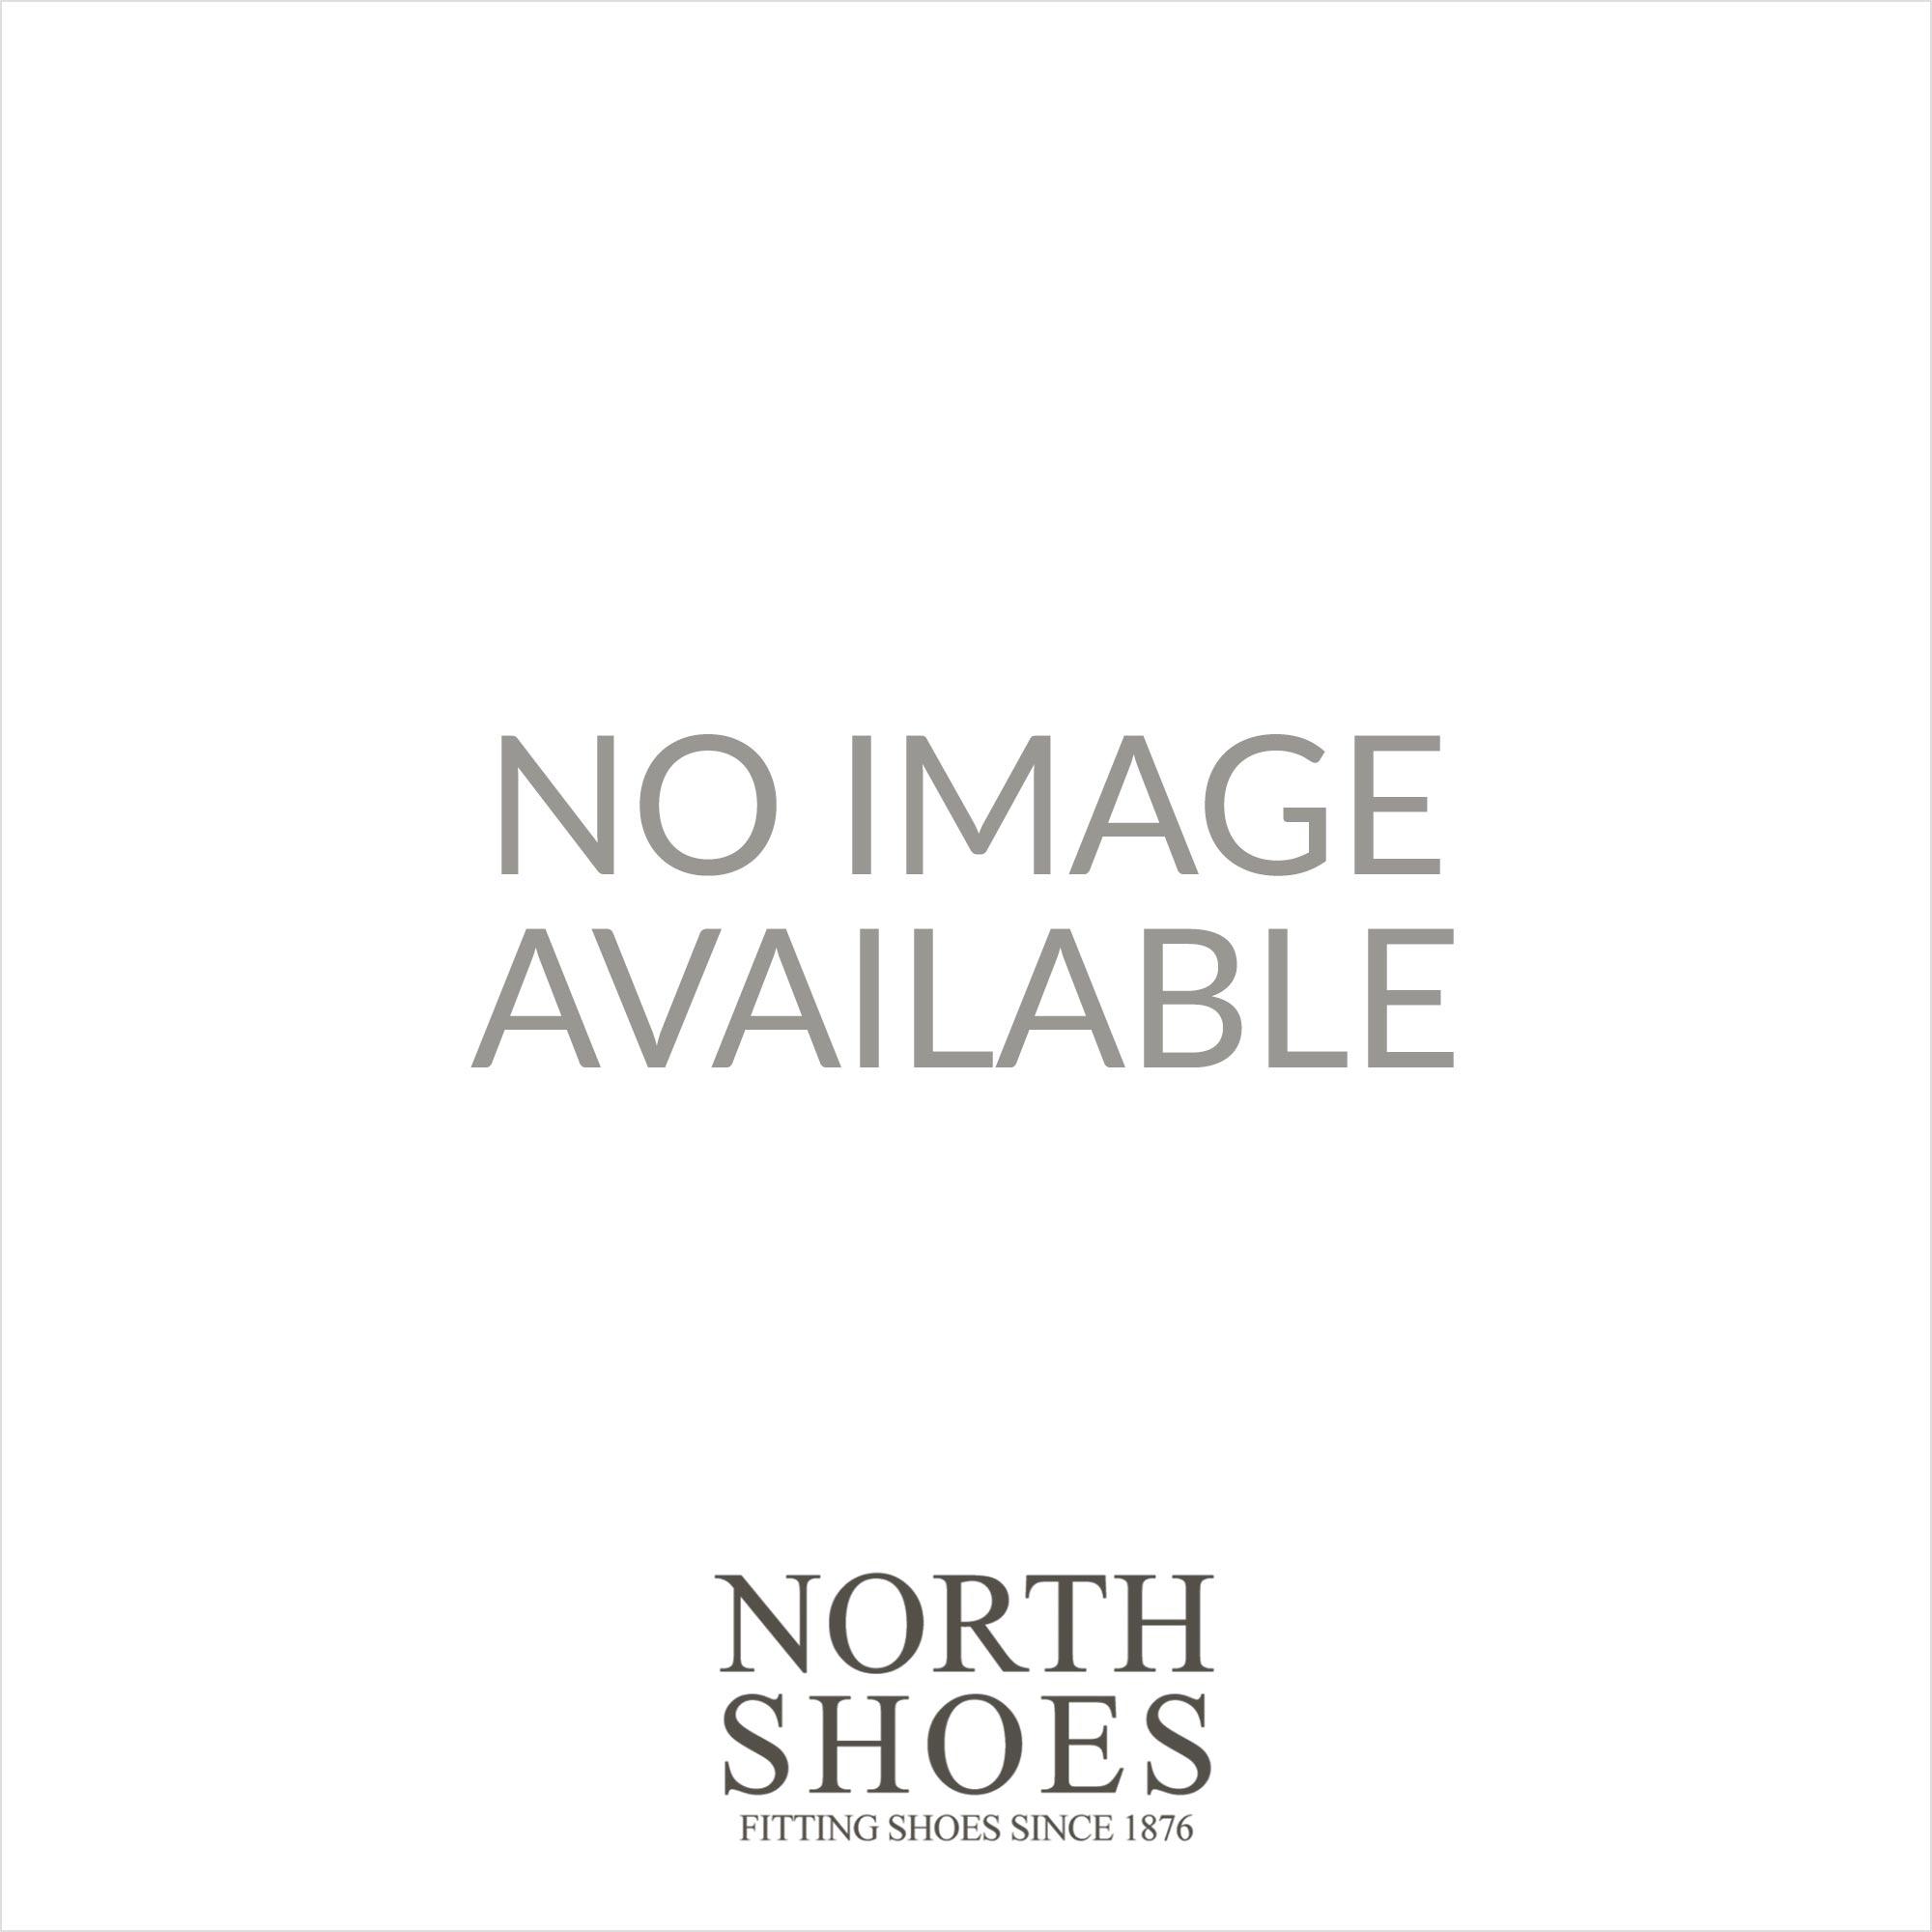 307c4000fb4 Clarks Comic Air Navy Camouflage Canvas Boys Casual Shoe - Clarks ...